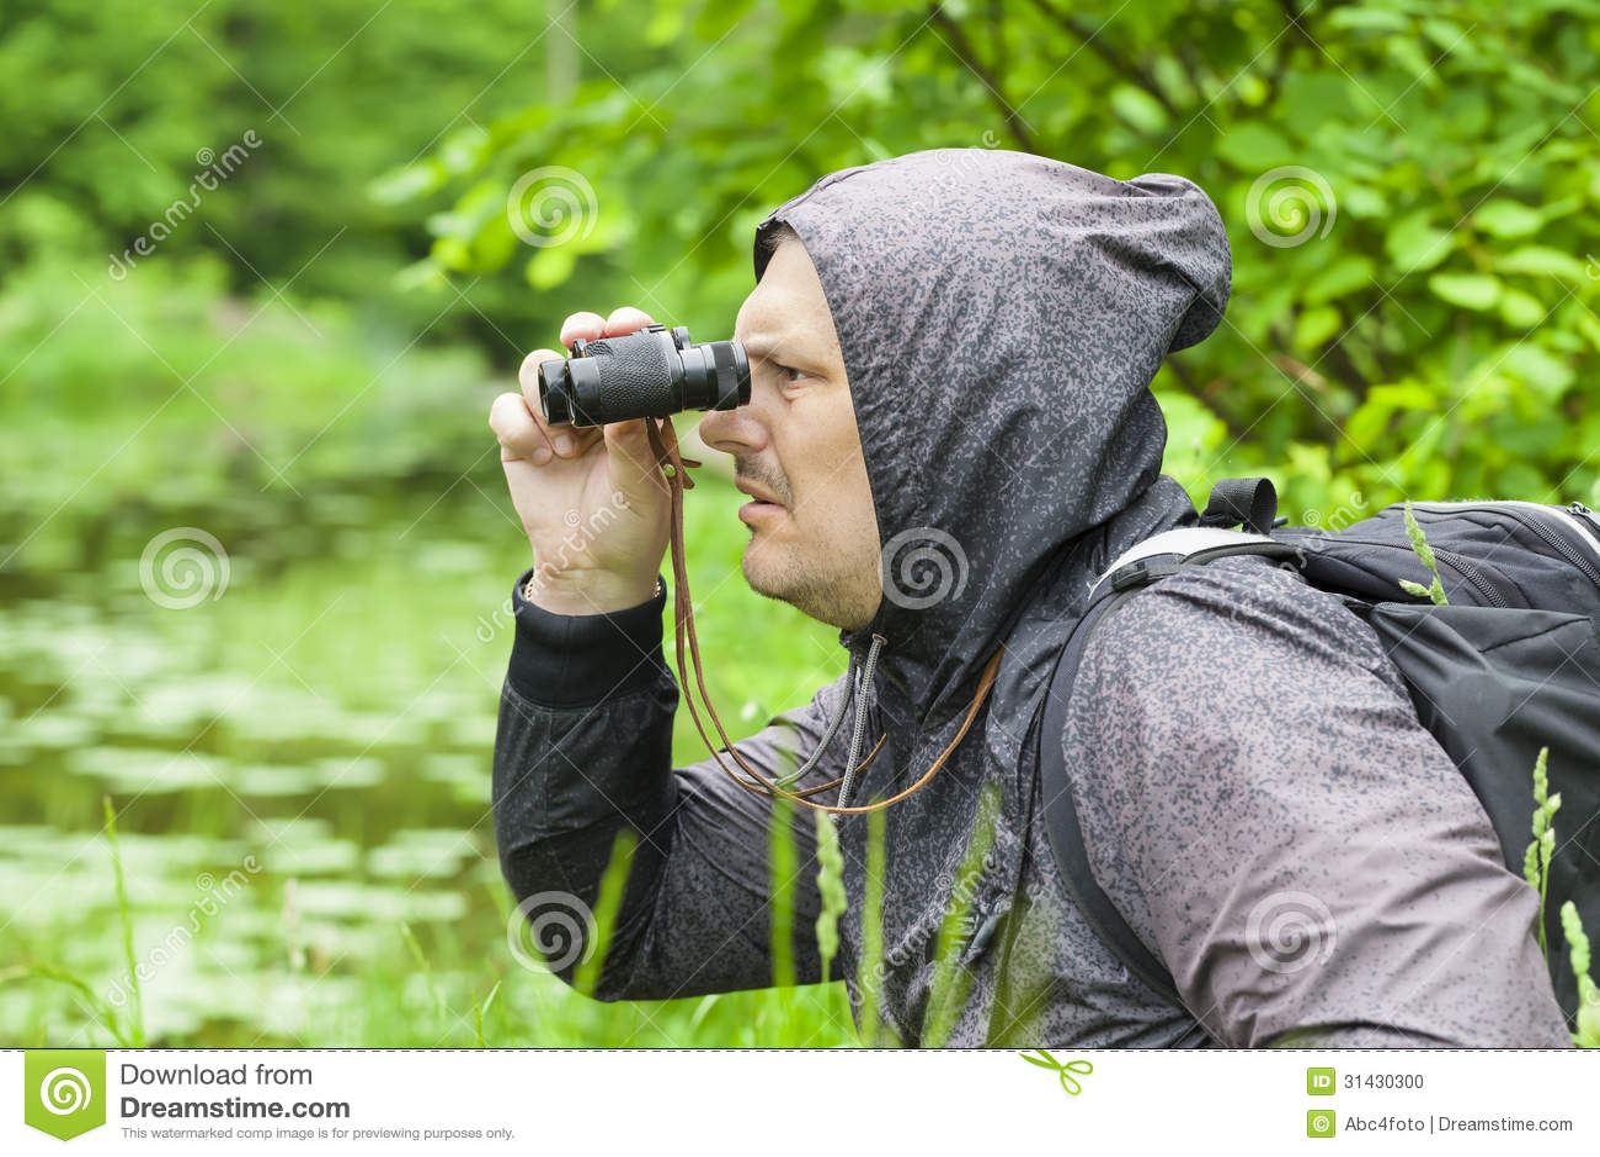 Man With Binoculars Watching Birds Stock Photo